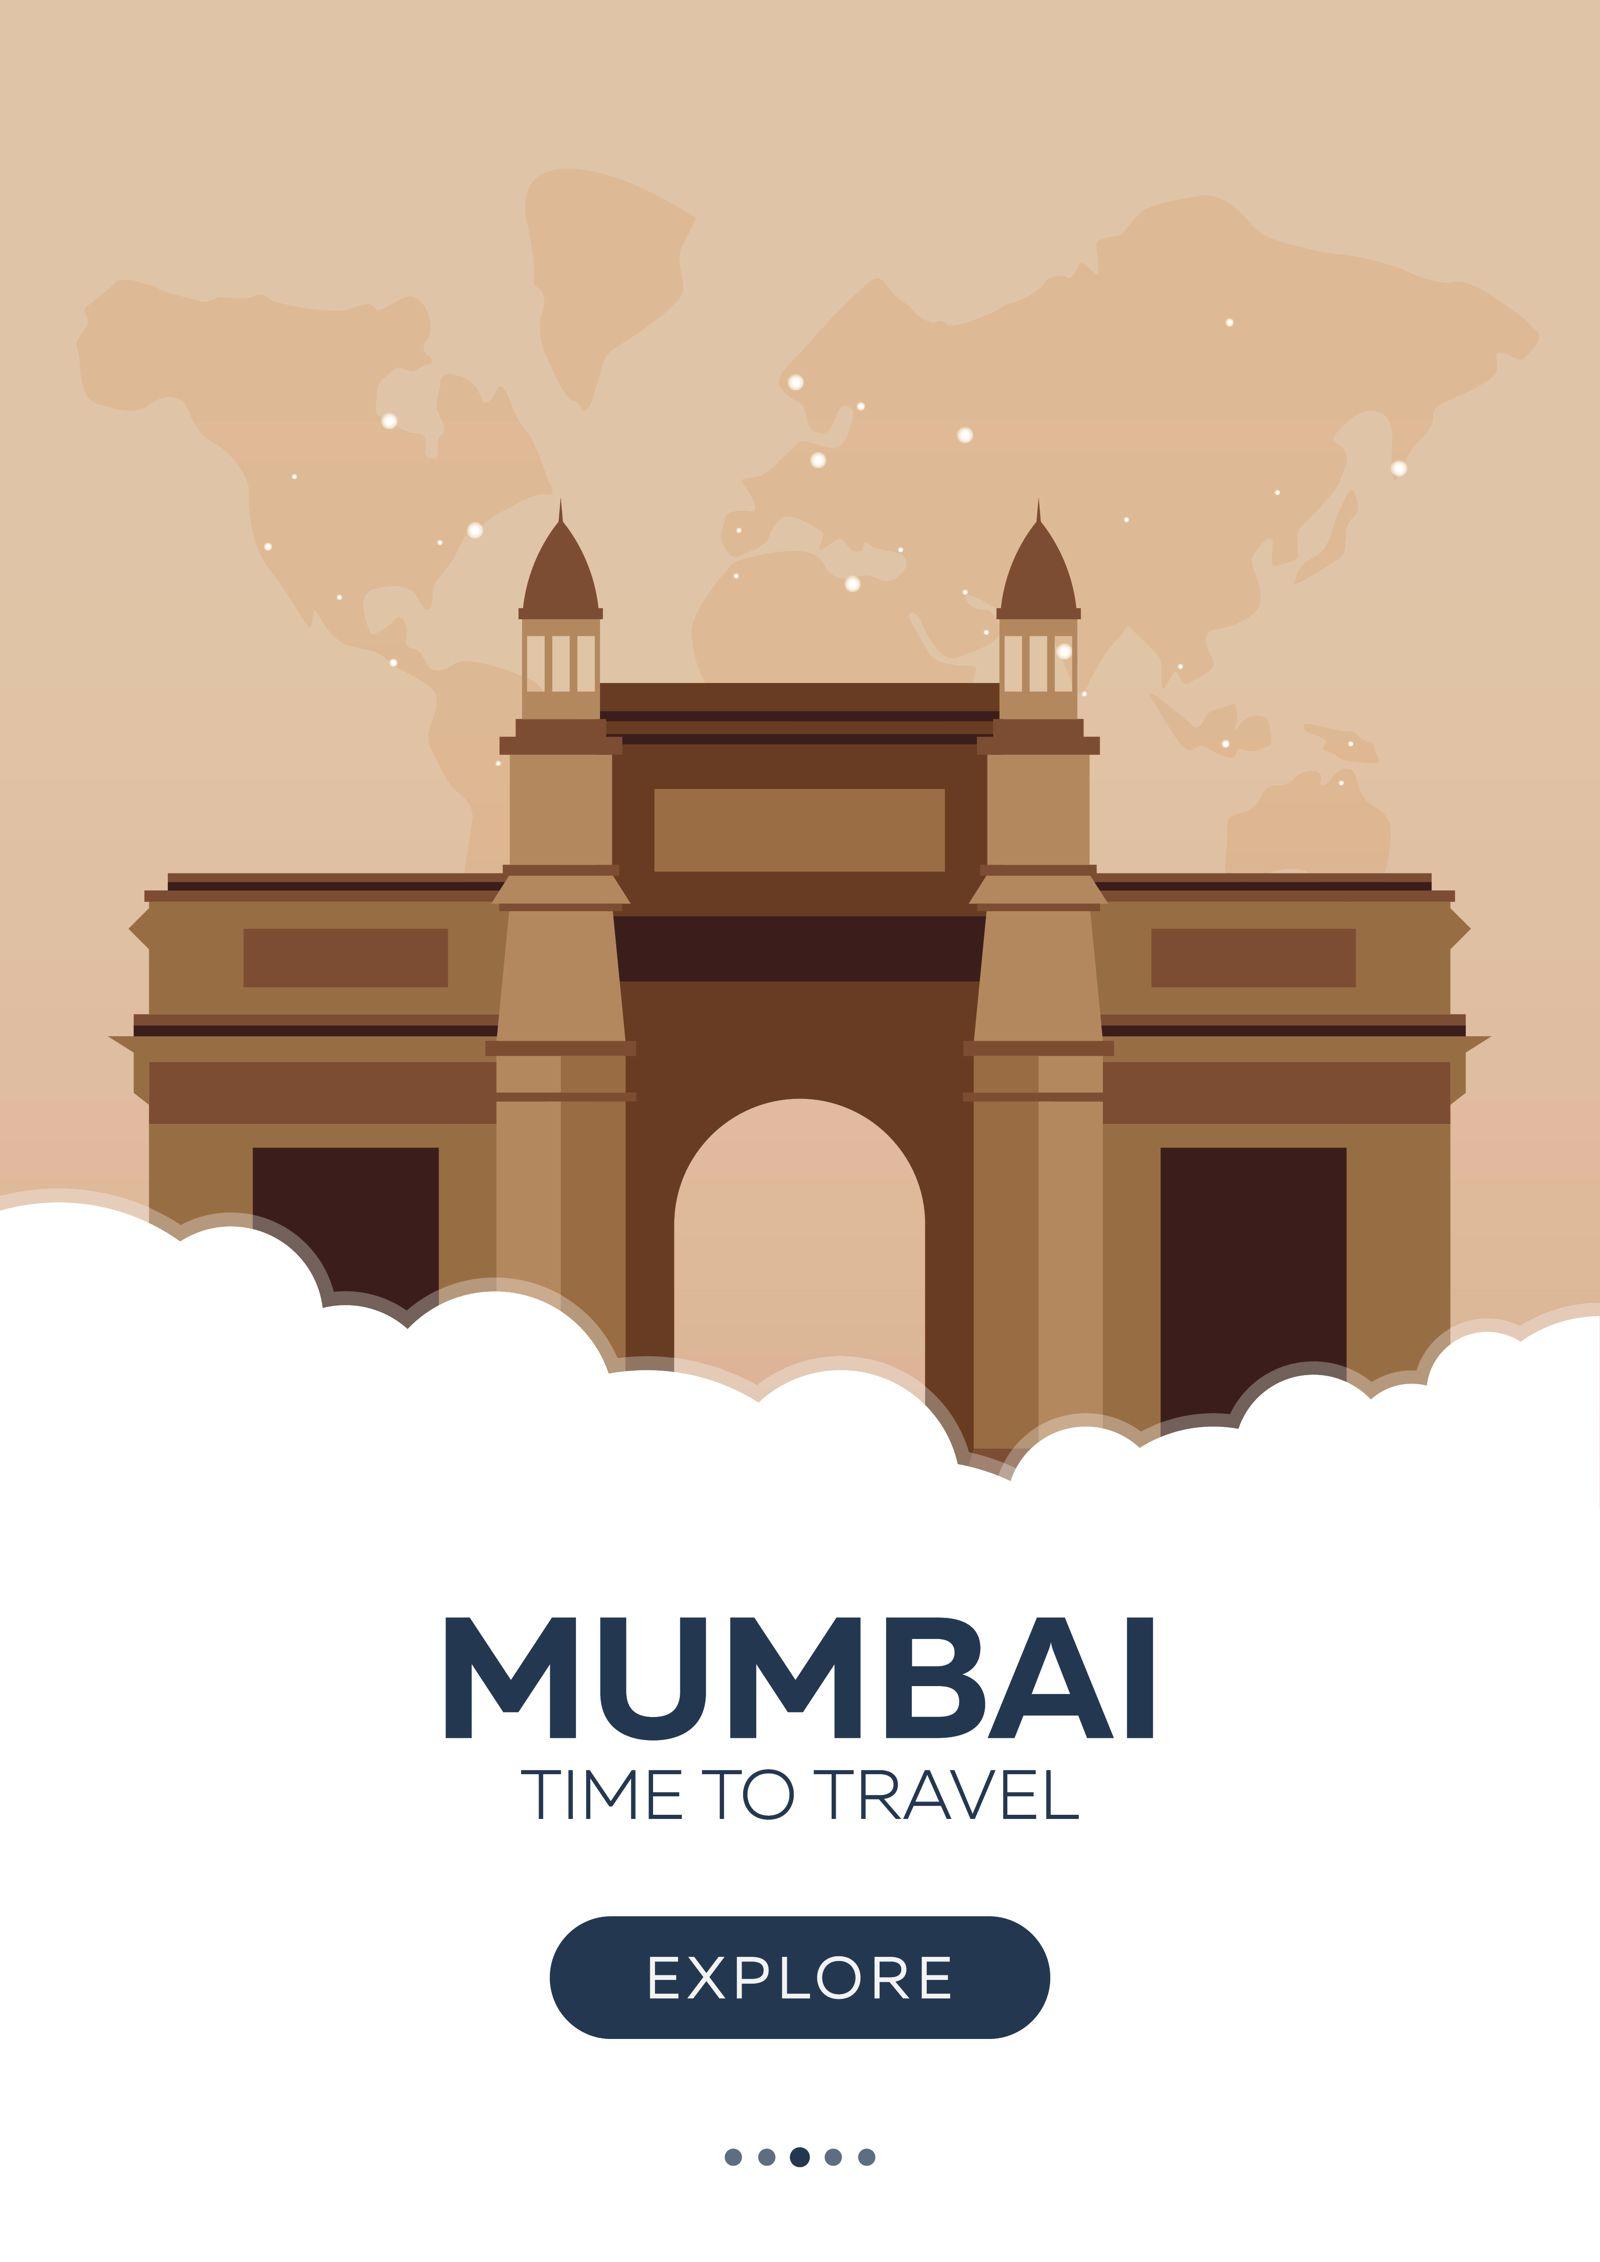 Things To See In Mumbai